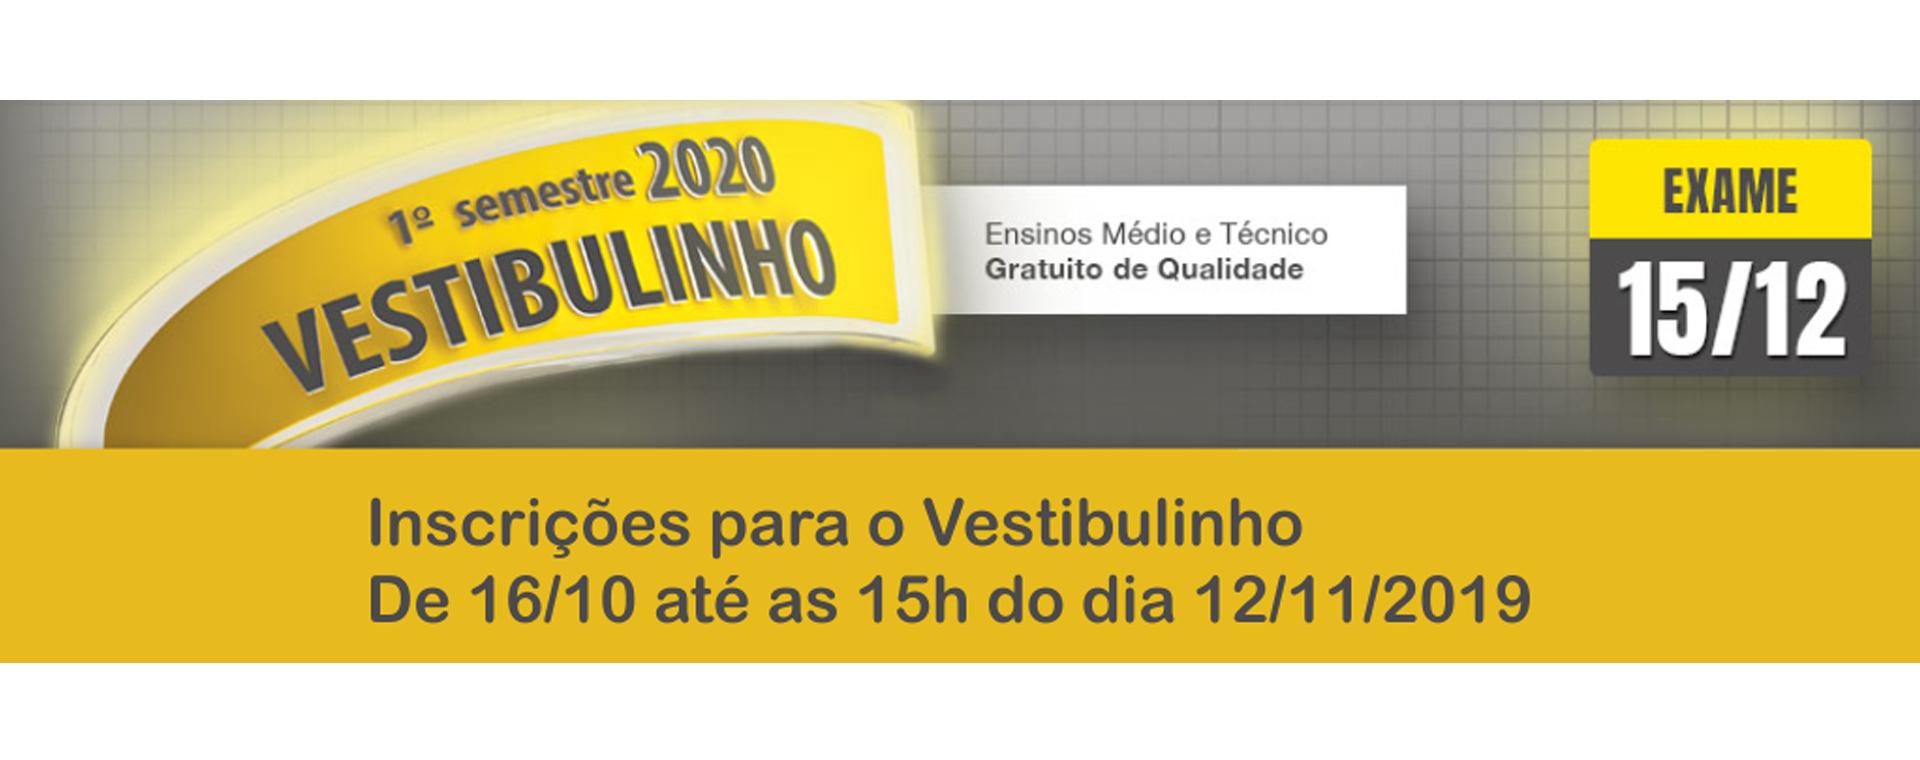 Vestibulinho 2020